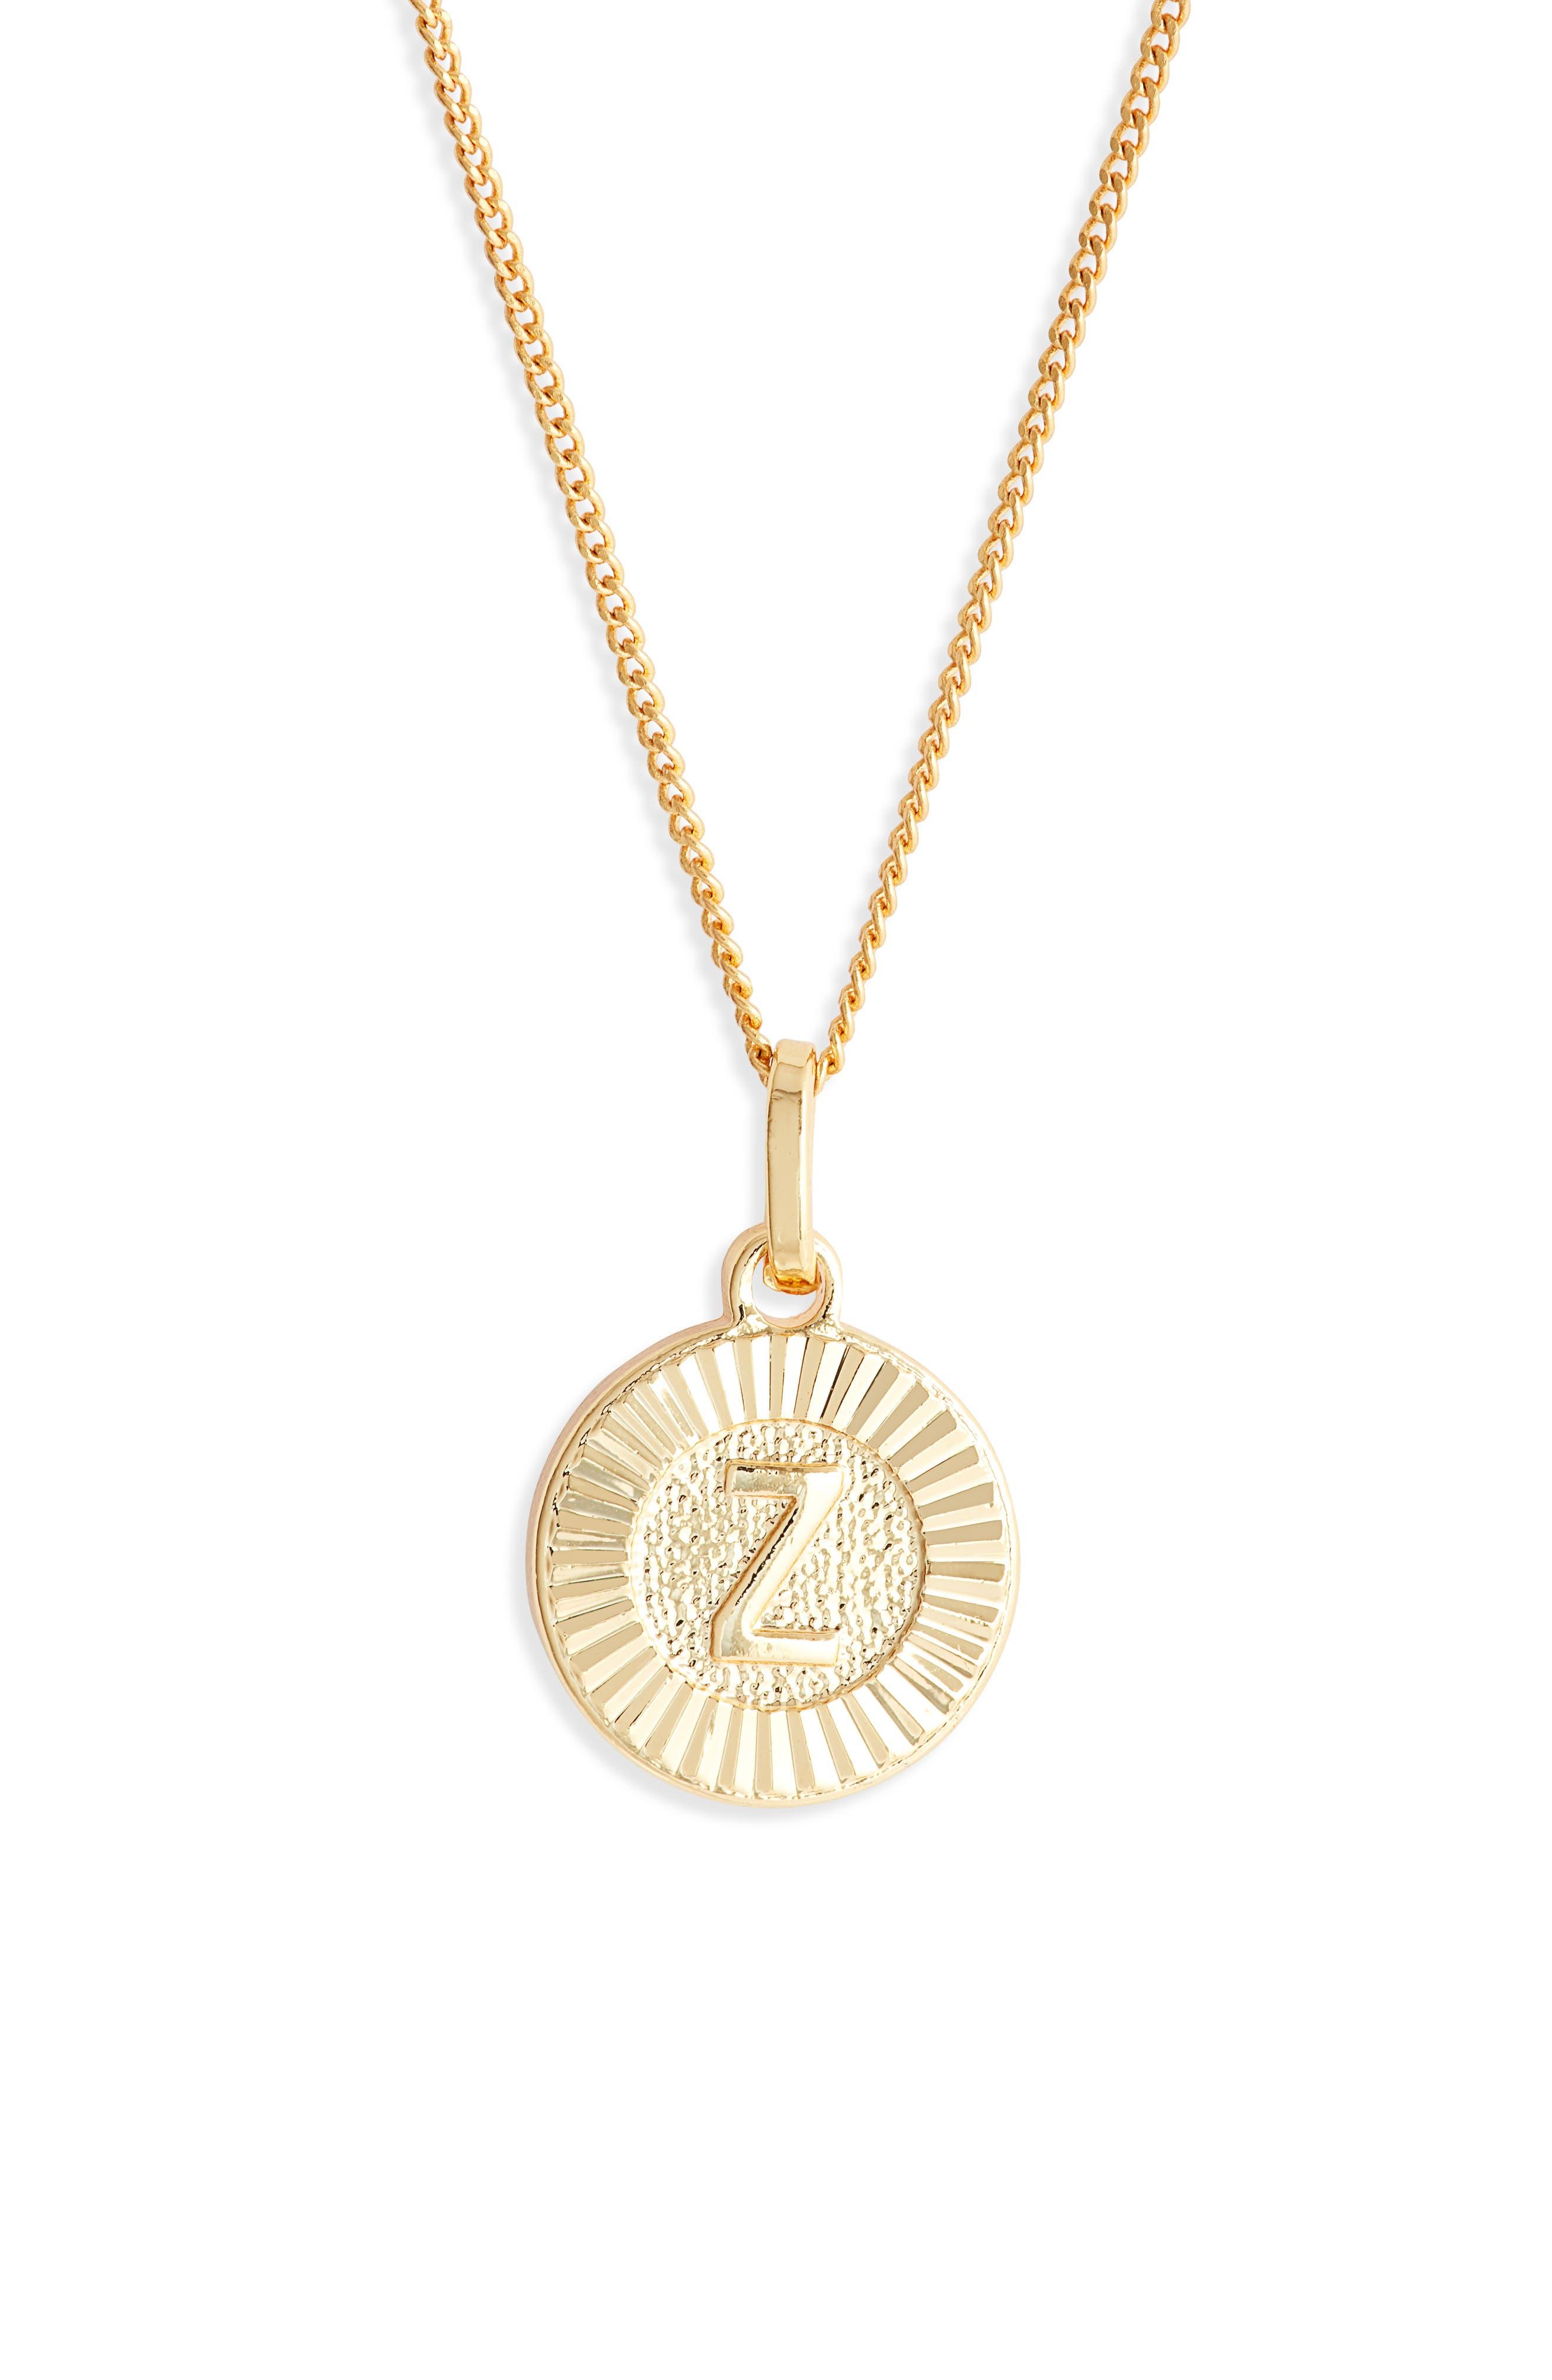 Initial Medallion Pendant Necklace